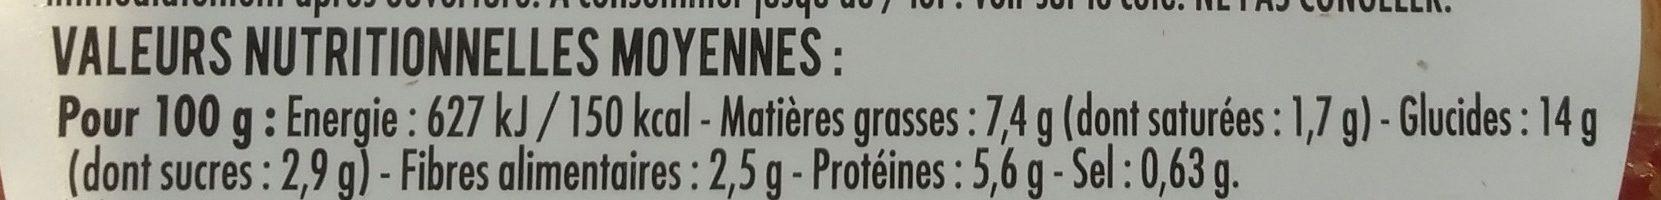 Salade pasta - Informations nutritionnelles - fr